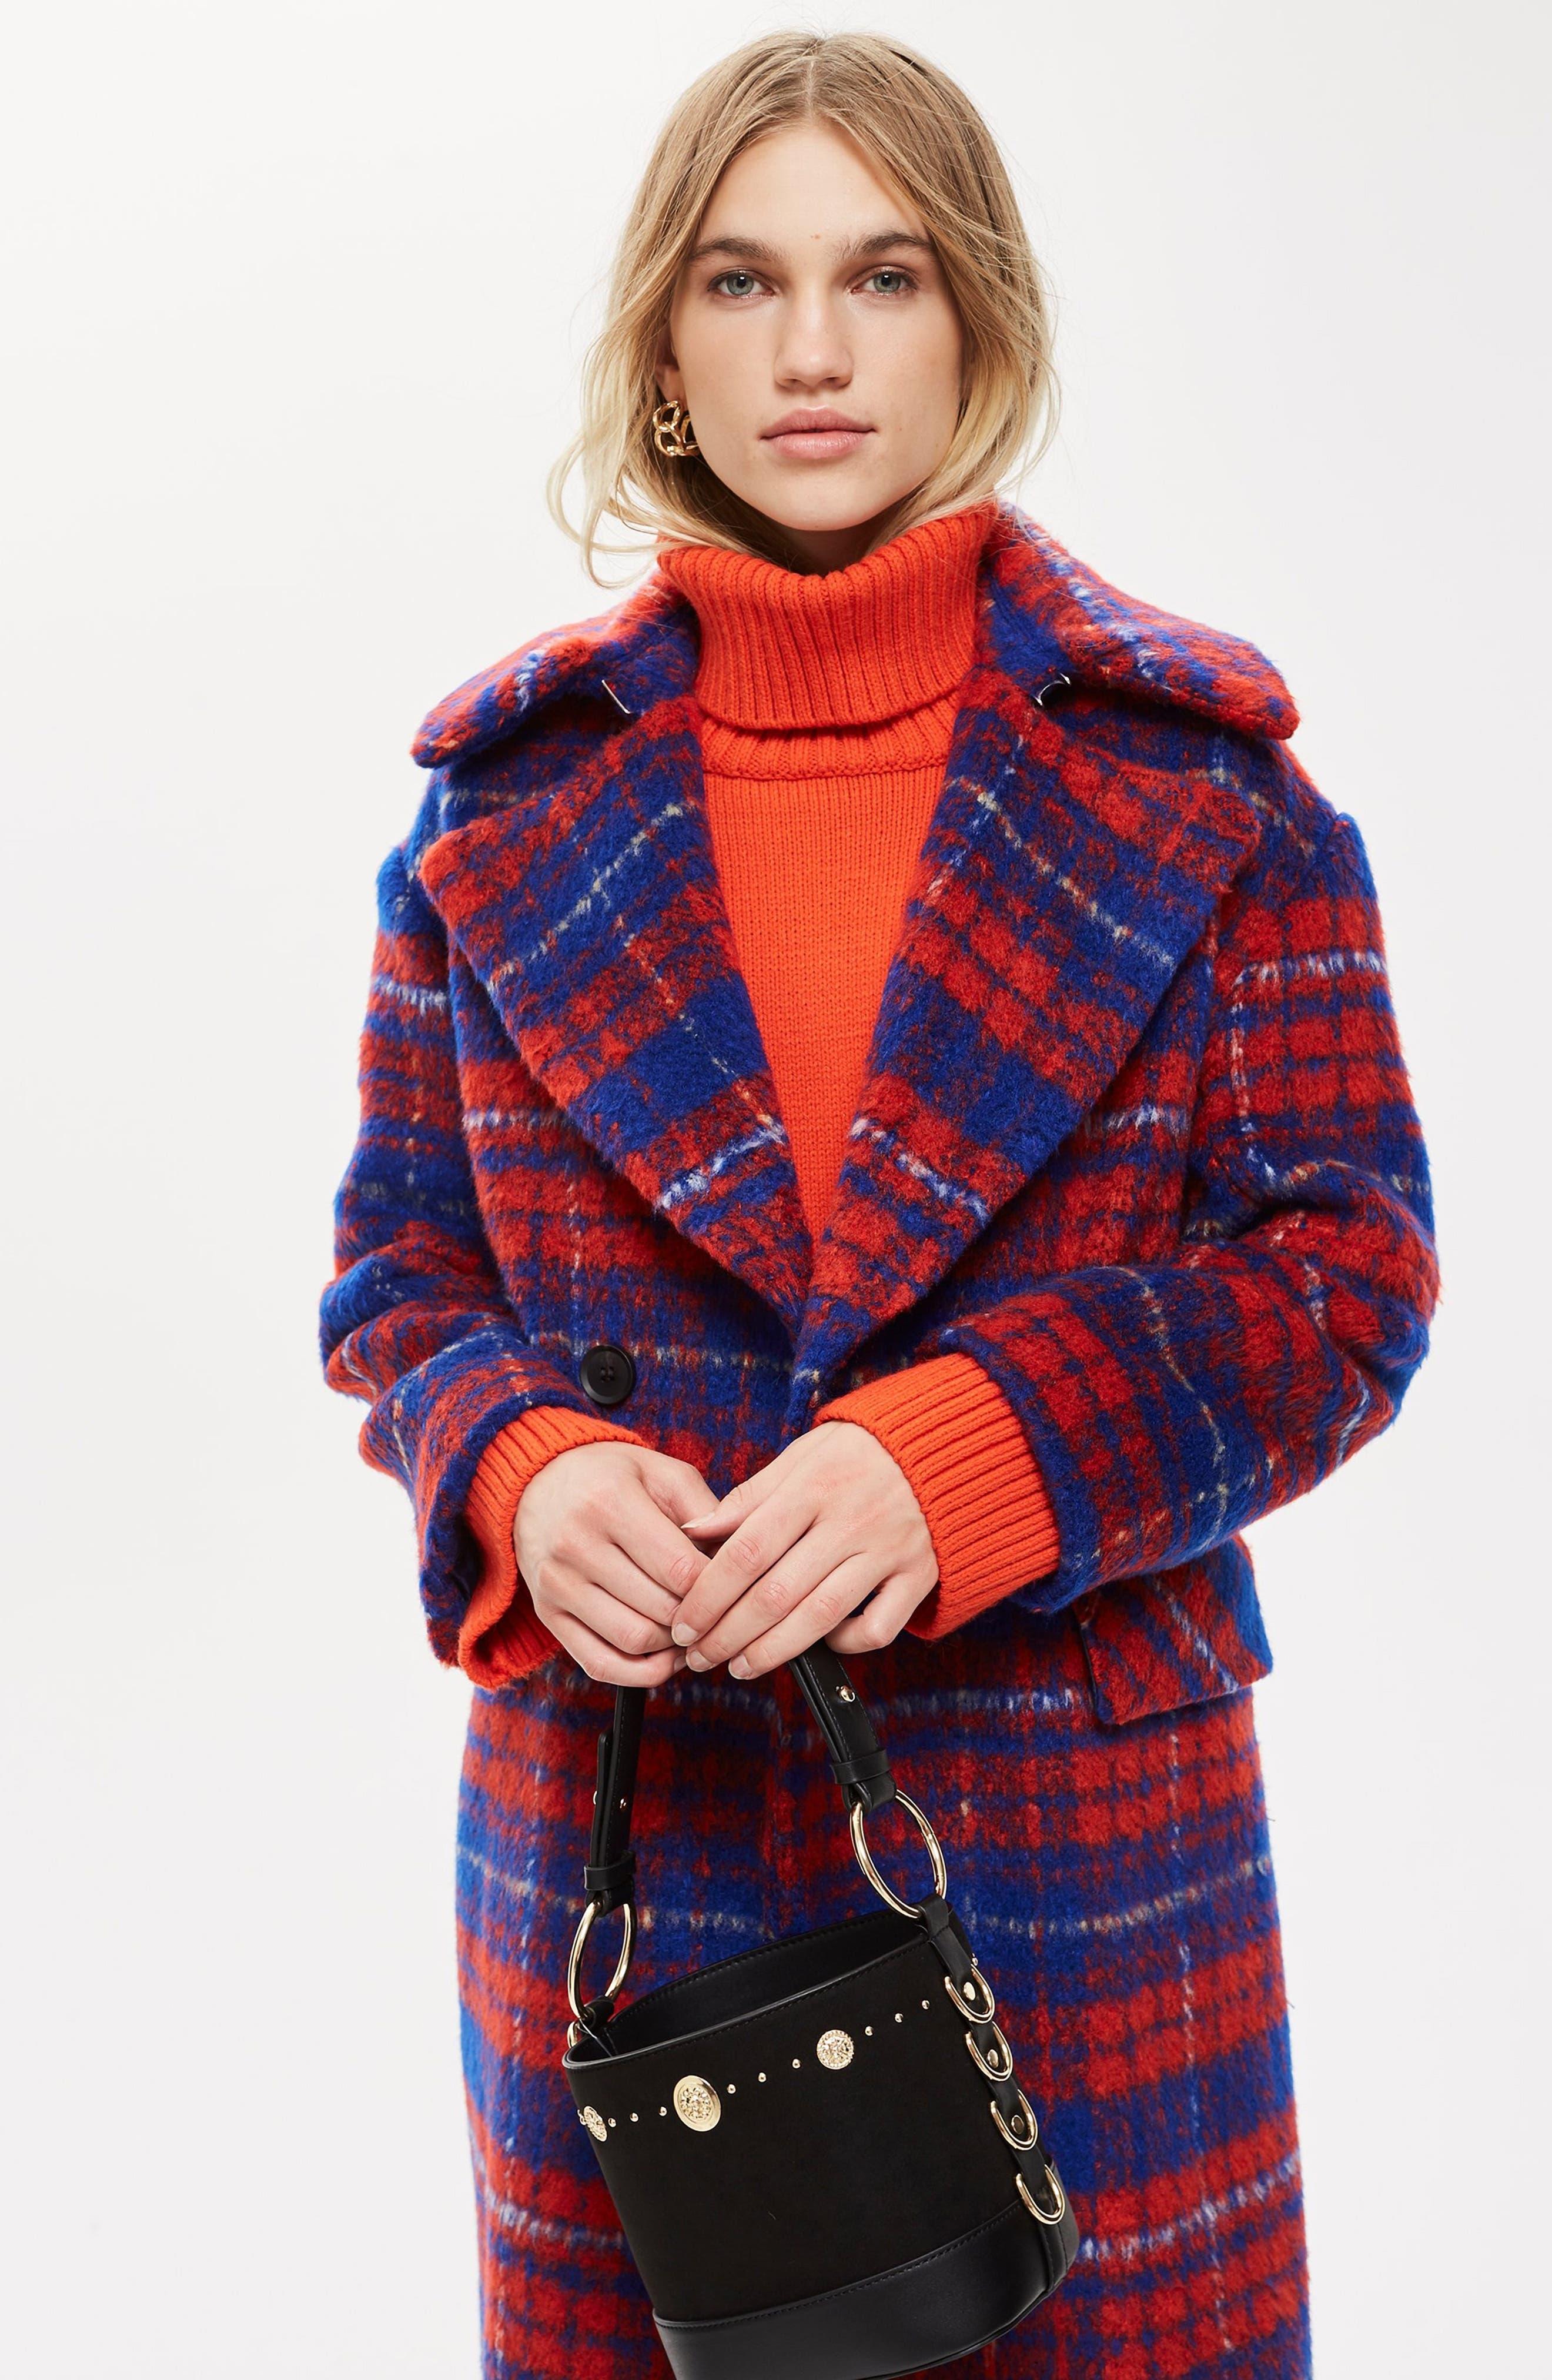 Bodika Check Coat,                             Alternate thumbnail 8, color,                             RED MULTI